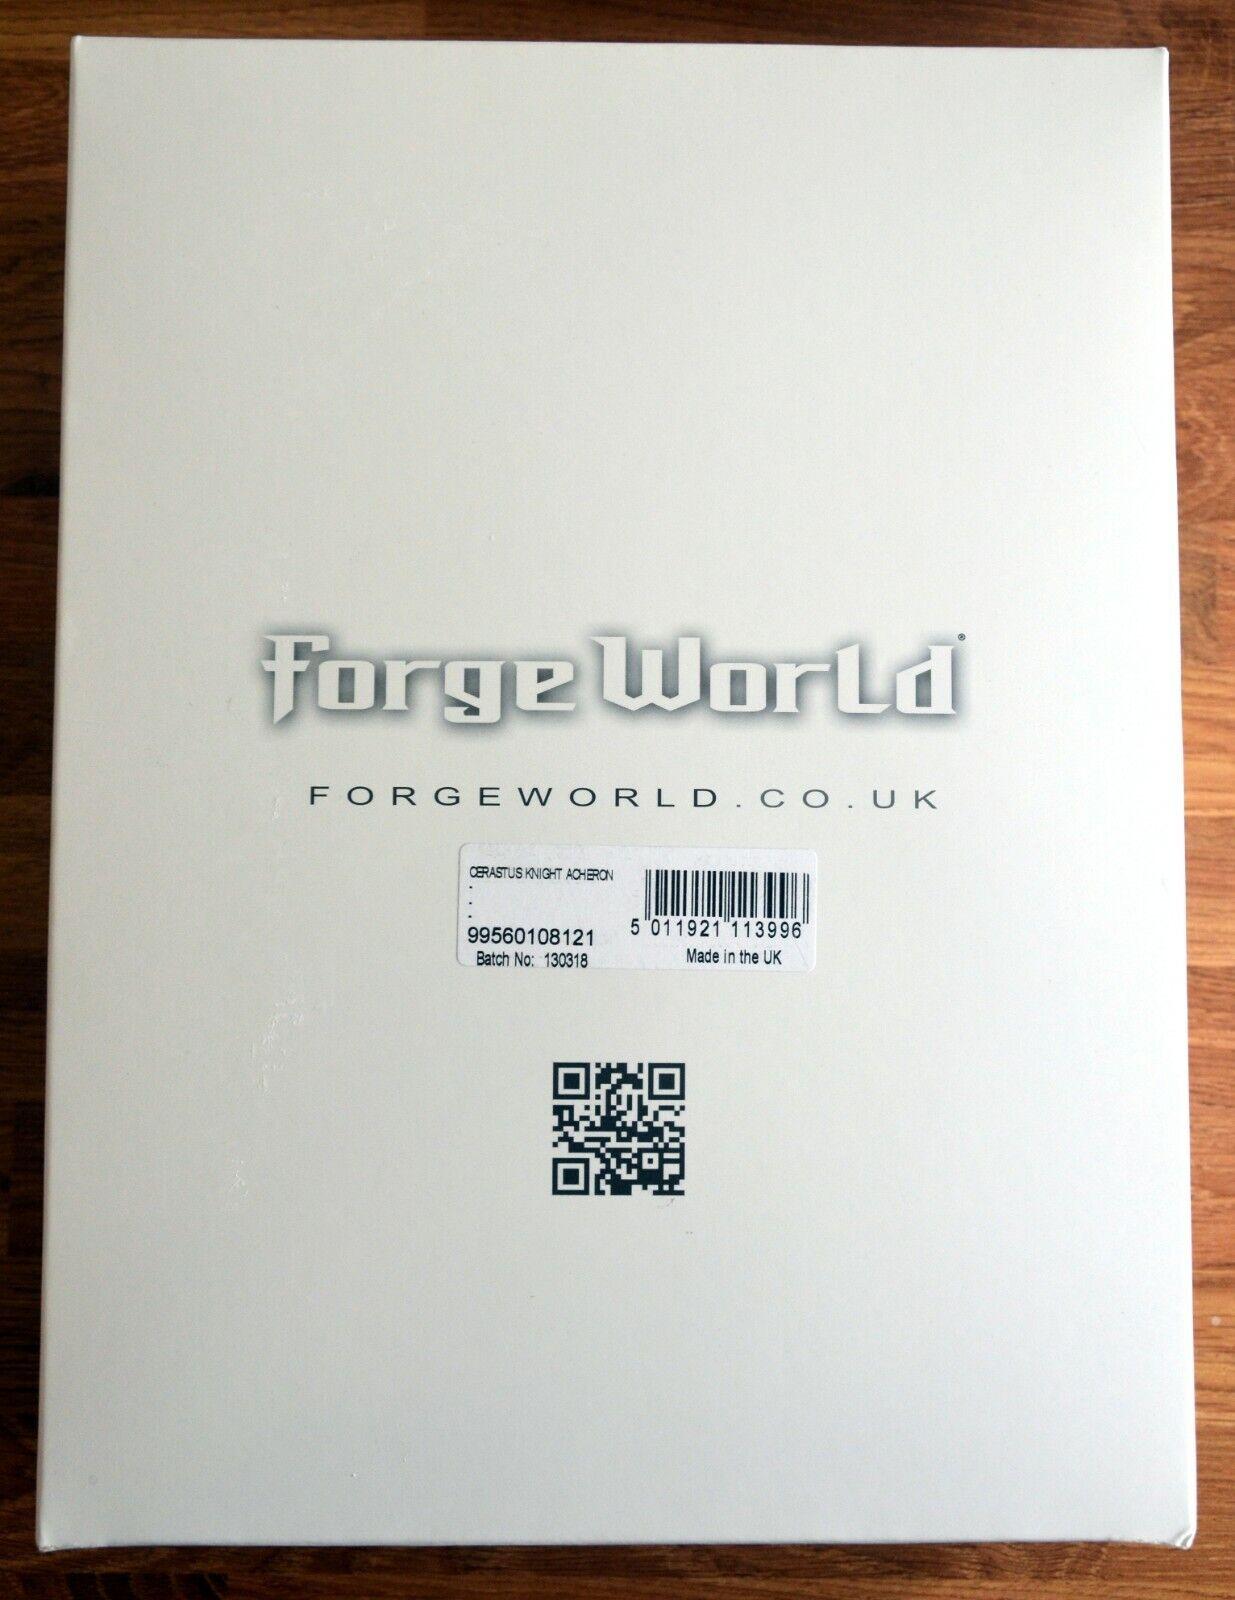 Warhammer 40k Imperial Caballero Forge World Acheron